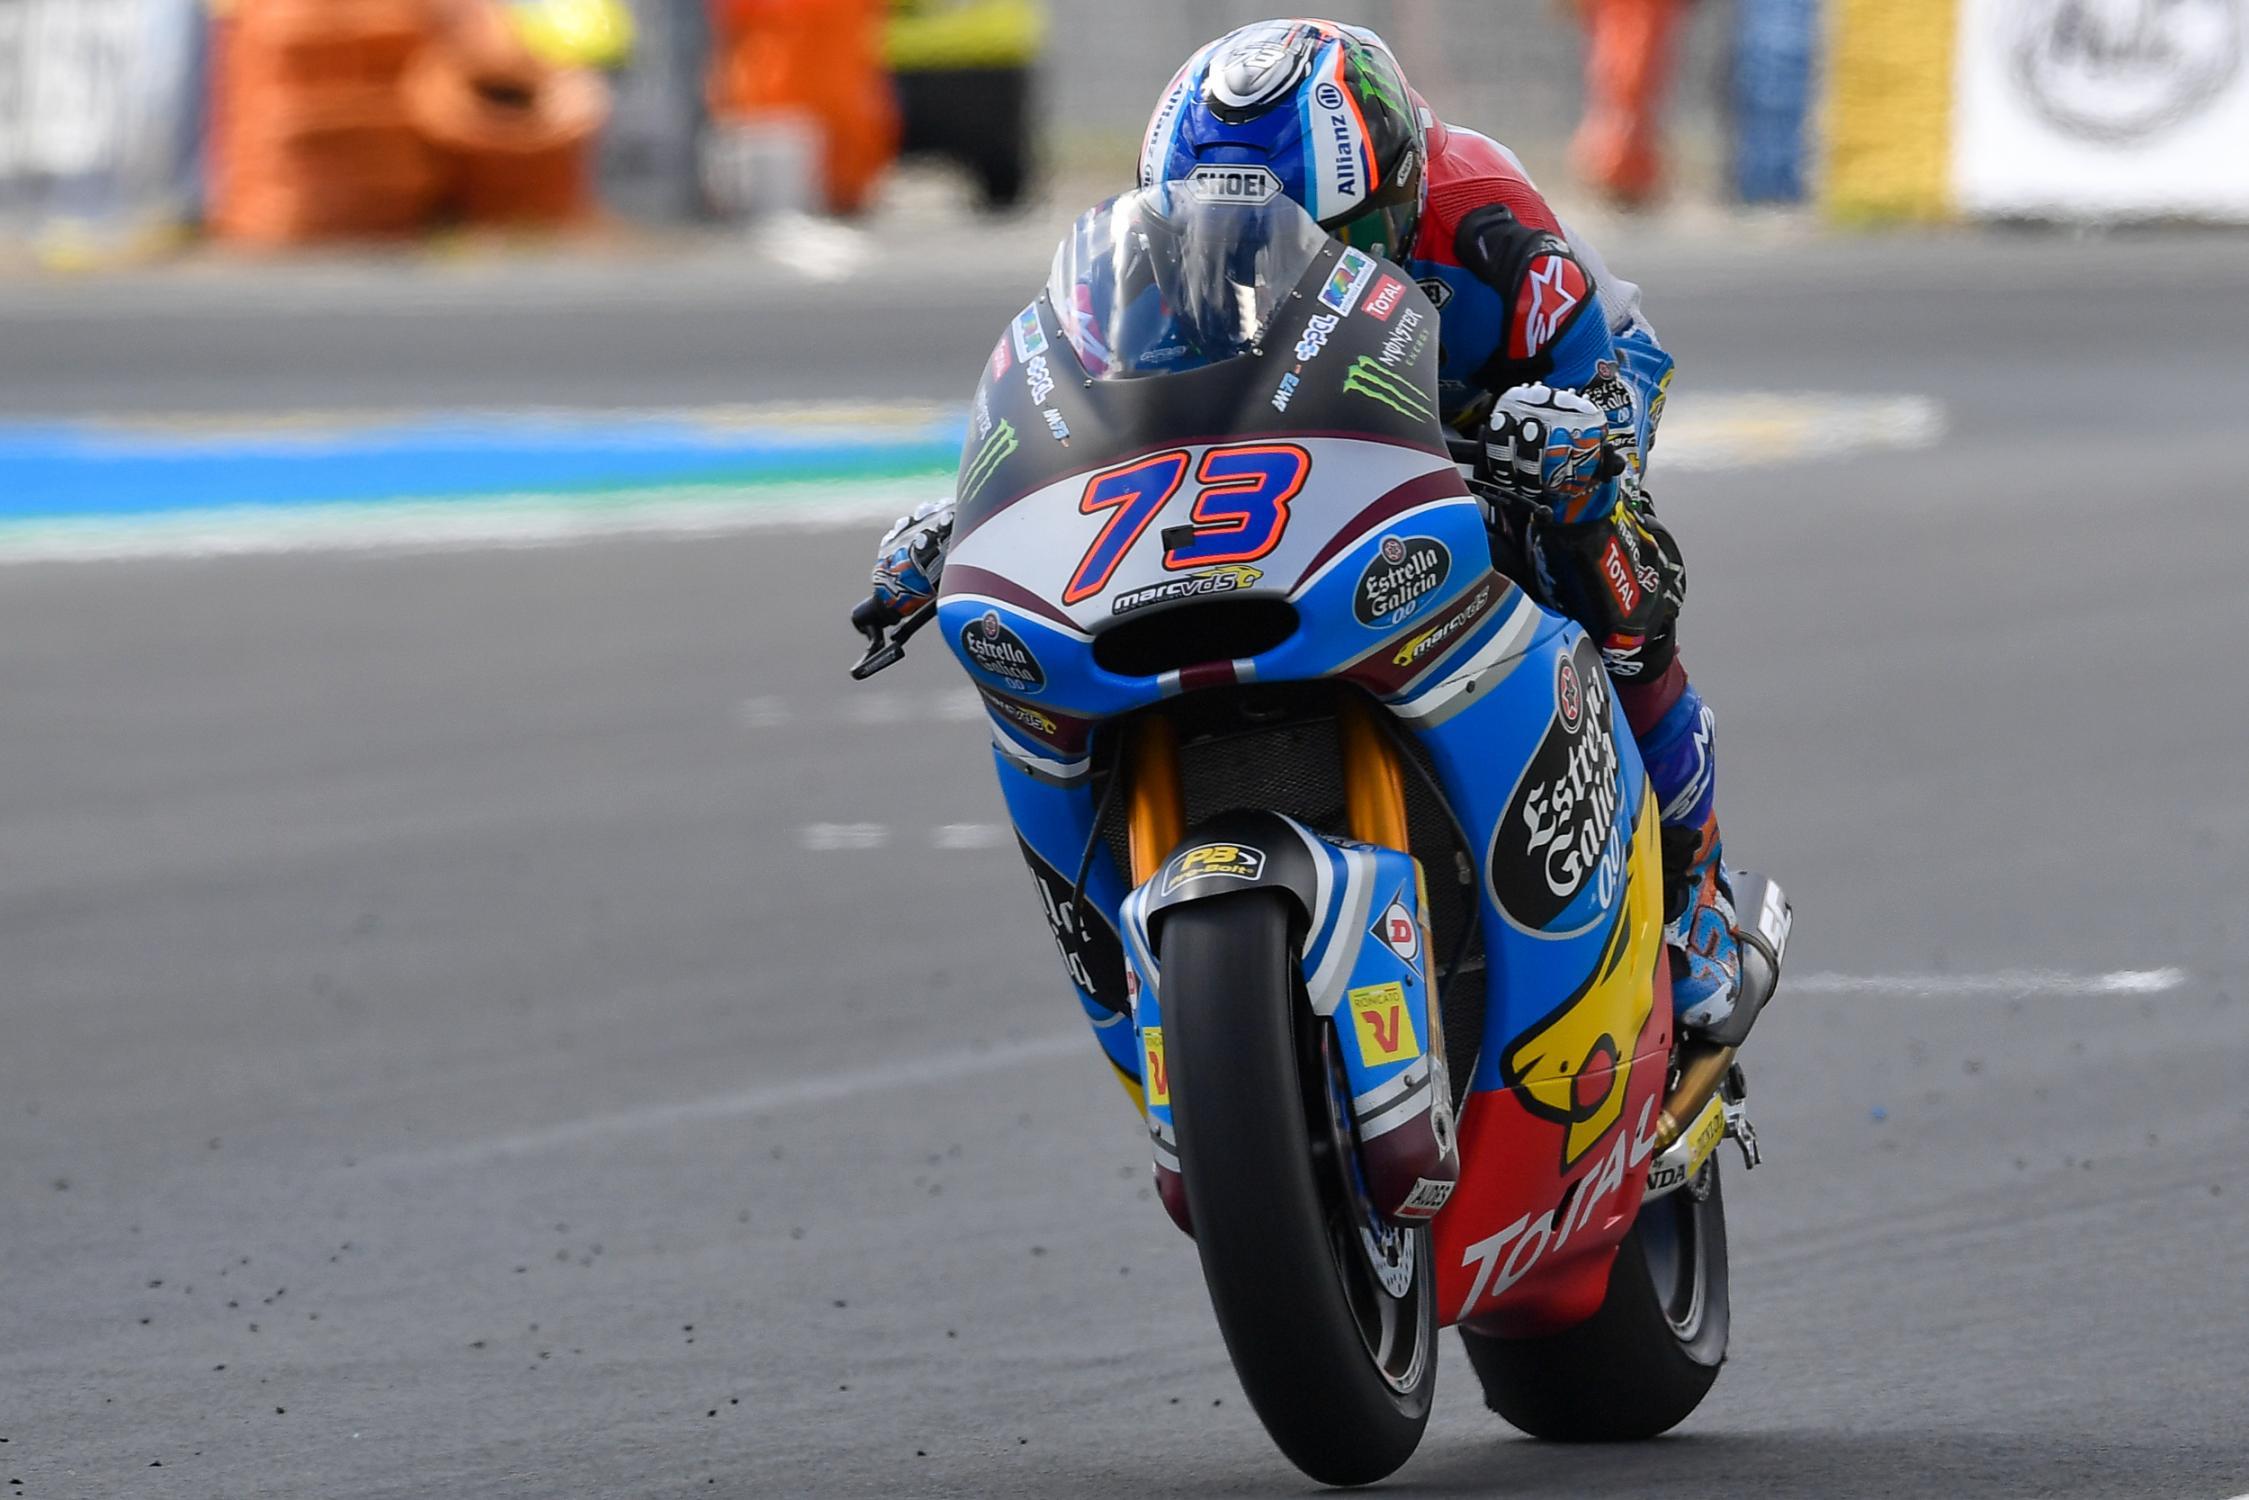 Motosan - Jorge Lorenzo contra Valentino Rossi, su primer